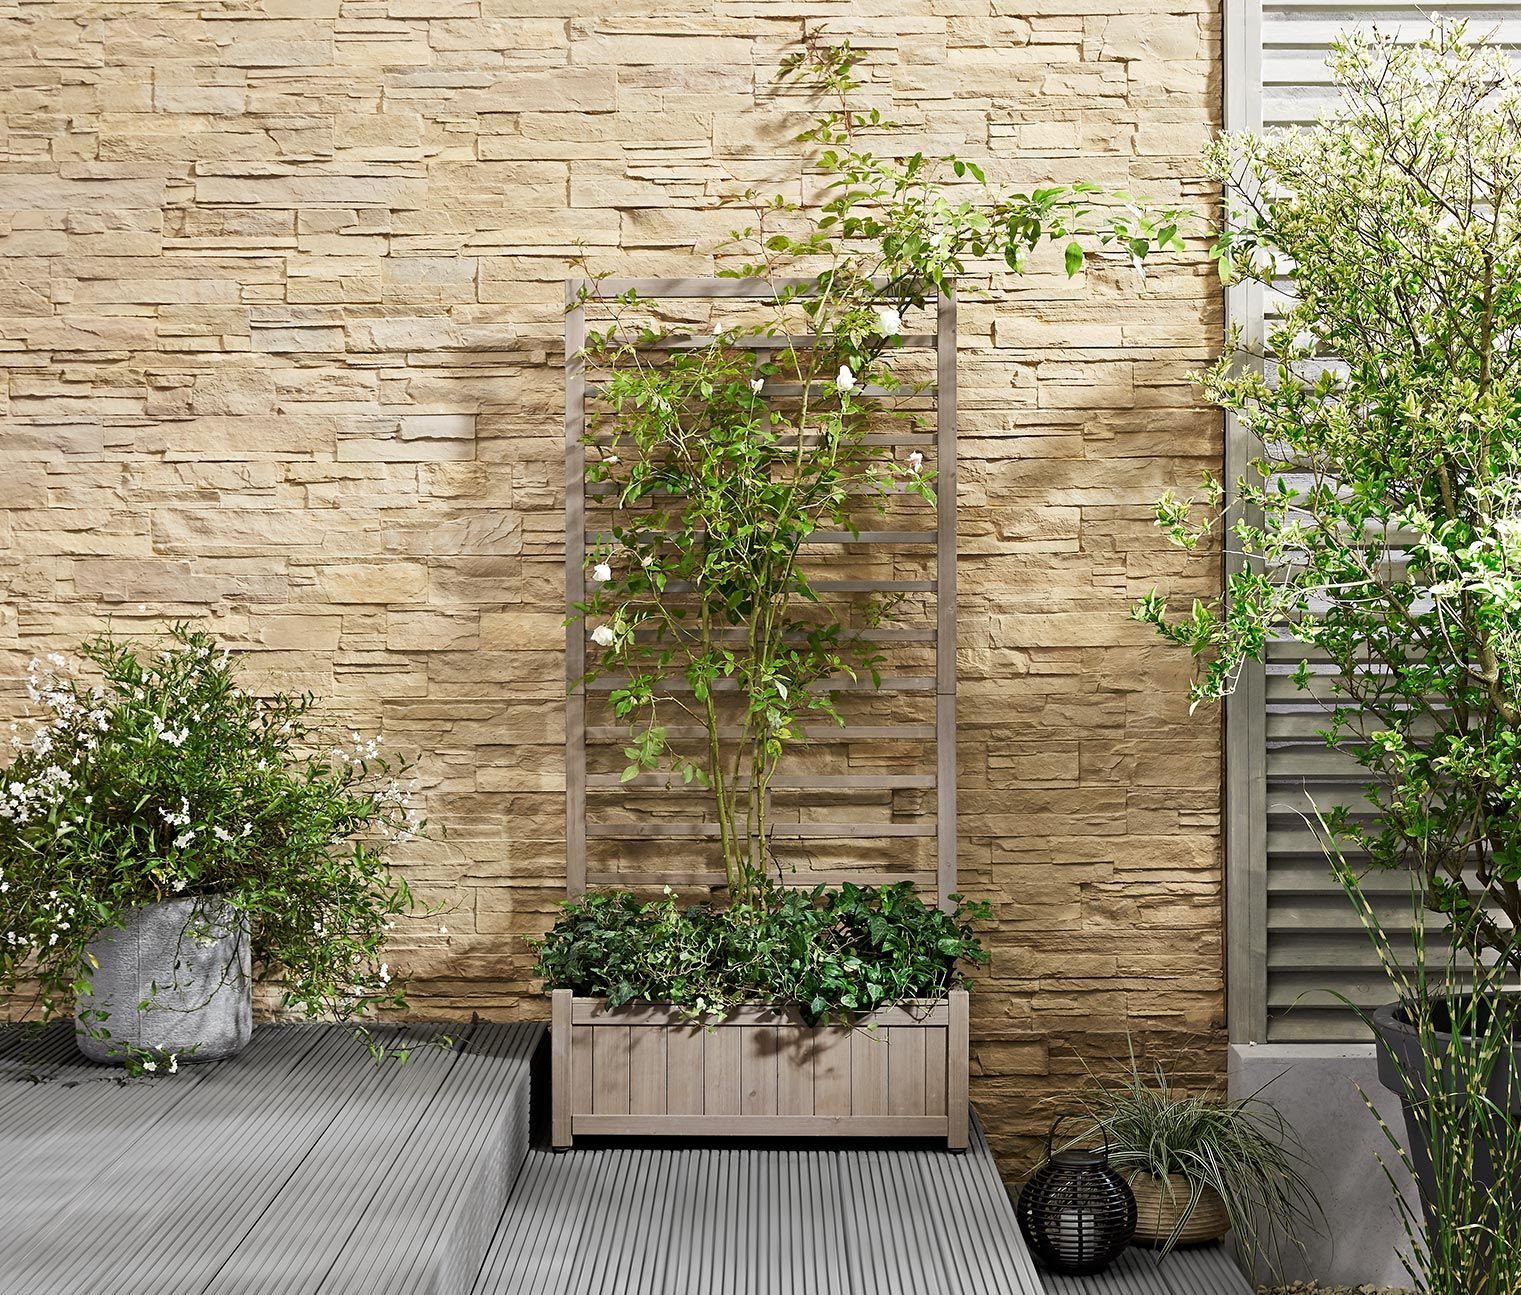 Racsos Viragtarto Futonovenyeknek 336661 A Tchibo Nal Flower Boxes Formal Garden Garden Projects